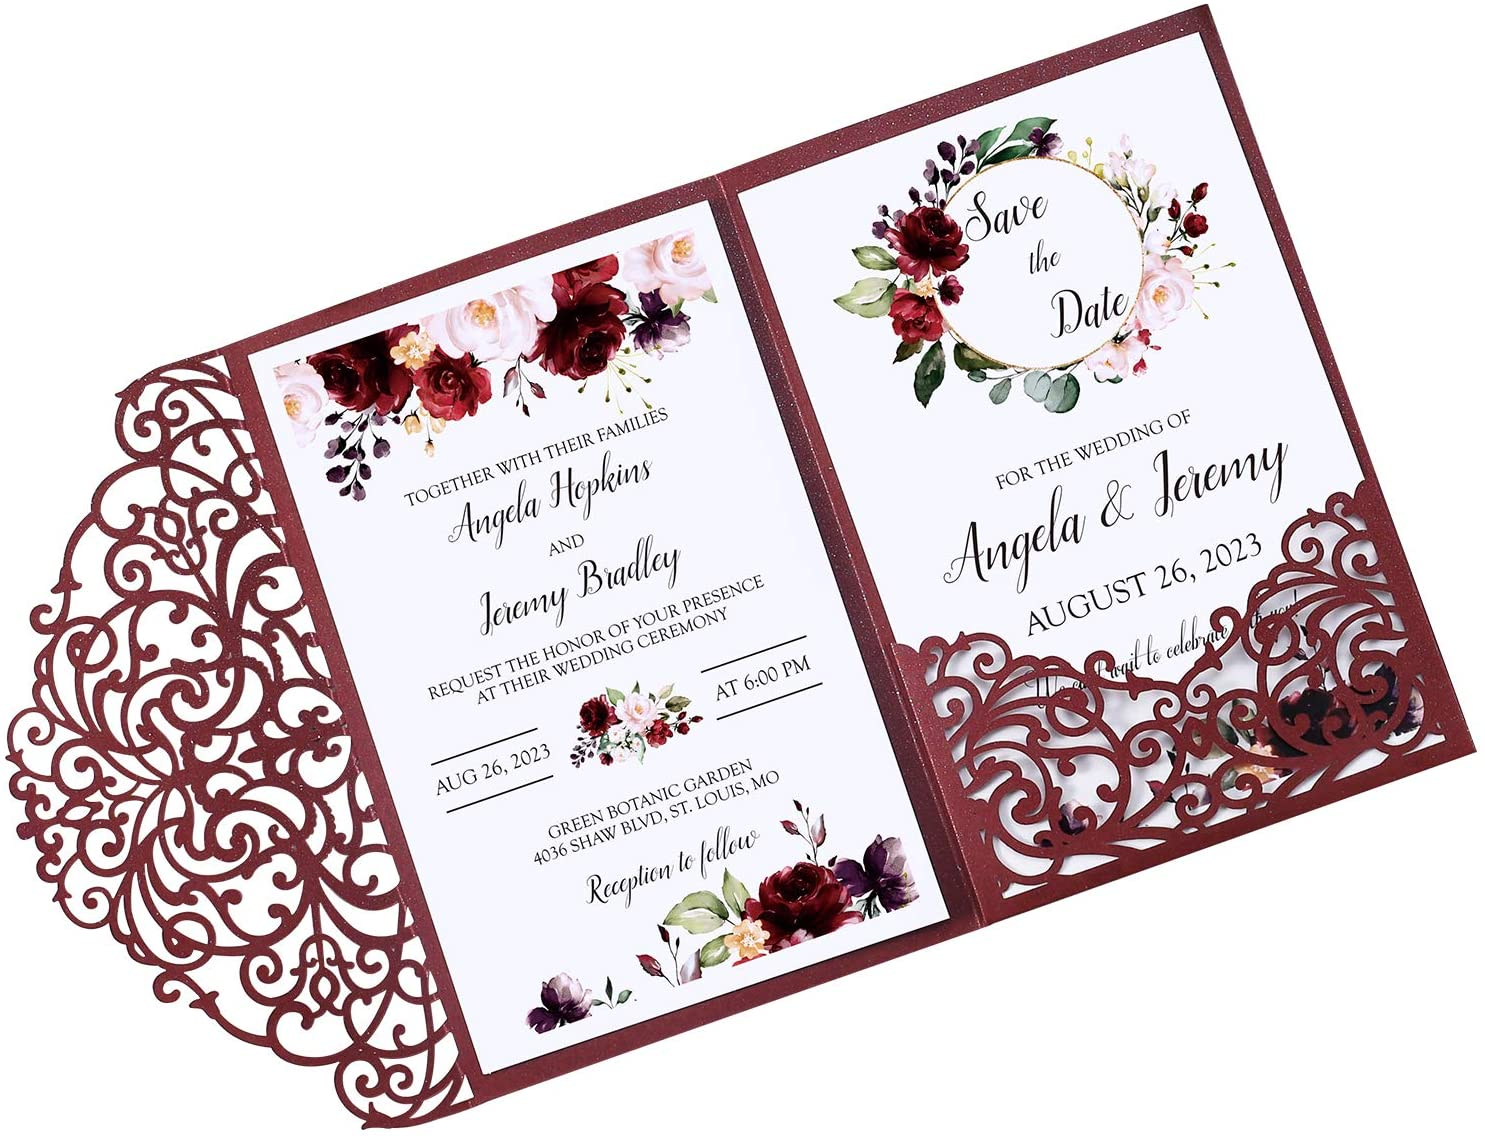 DORISHOME 50PCS Blank 4.7x7 Inch Burgundy Wedding Invitation Kits Laser Cut Hollow Rose Pocket Wedding Invitations with Envelopes For Wedding Bridal Shower Engagement Invite